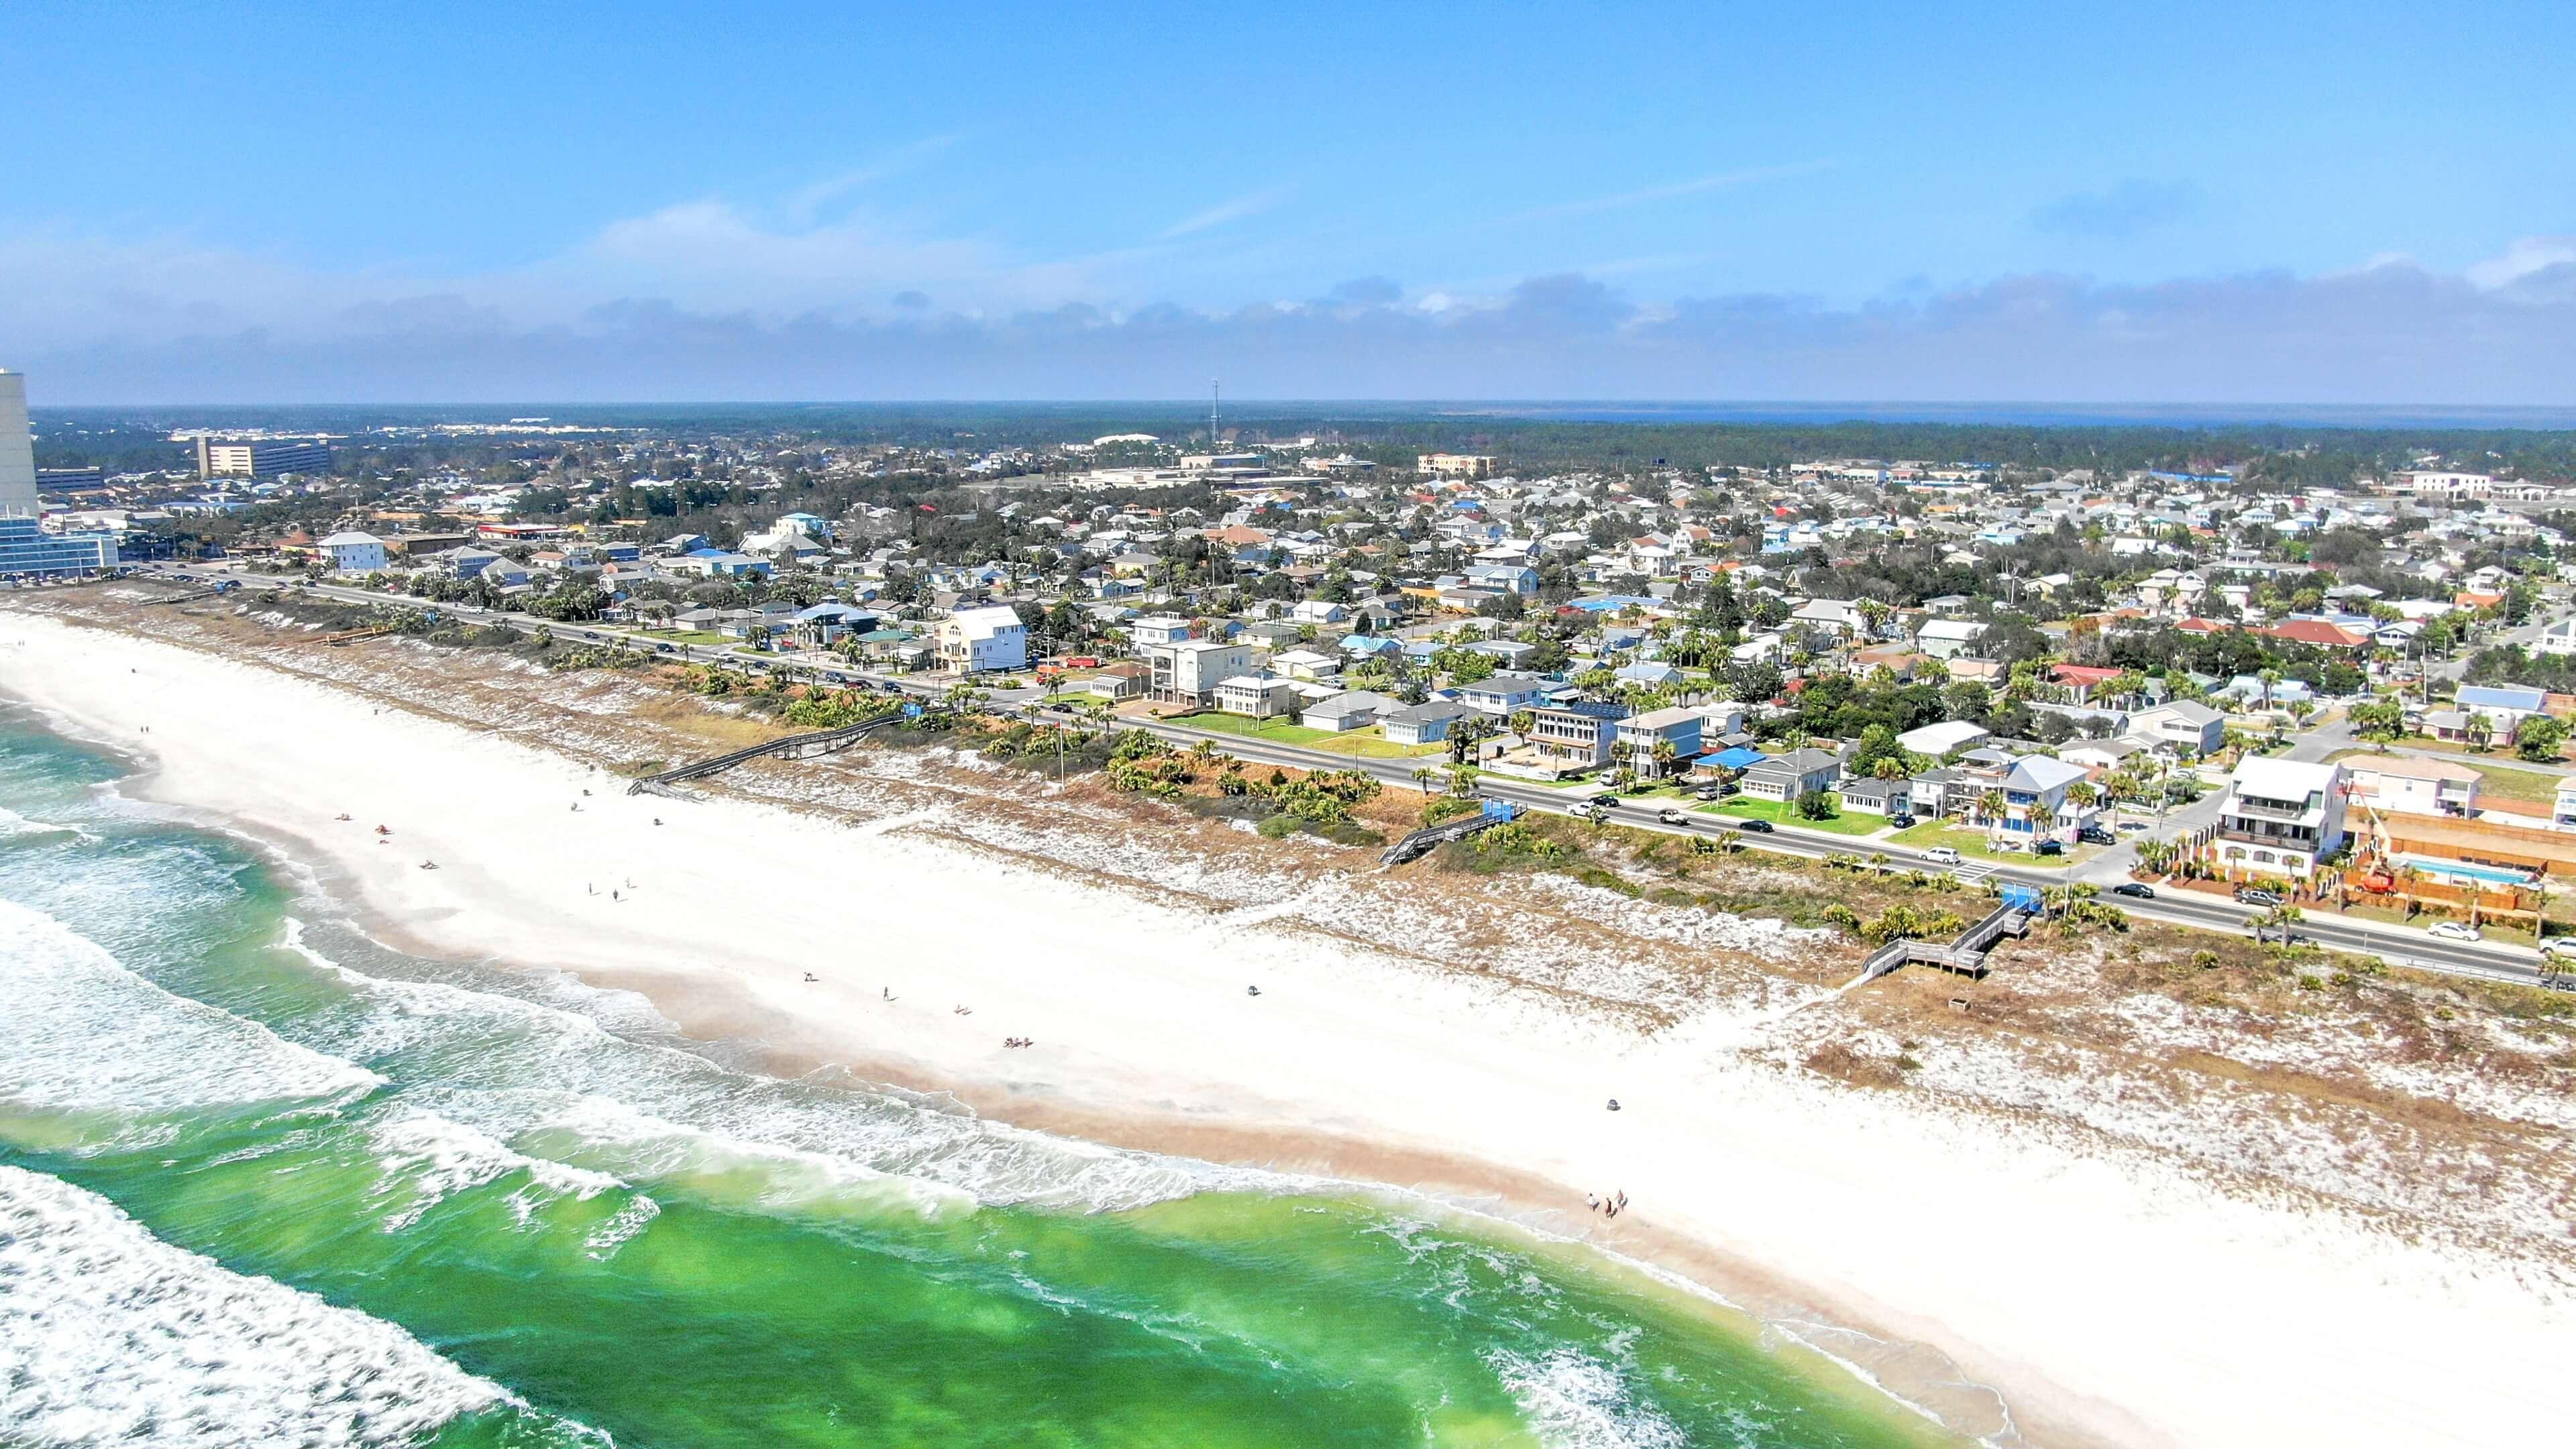 Bid A Wee Homes For Sale Bid A Wee Real Estate In Panama City Beach